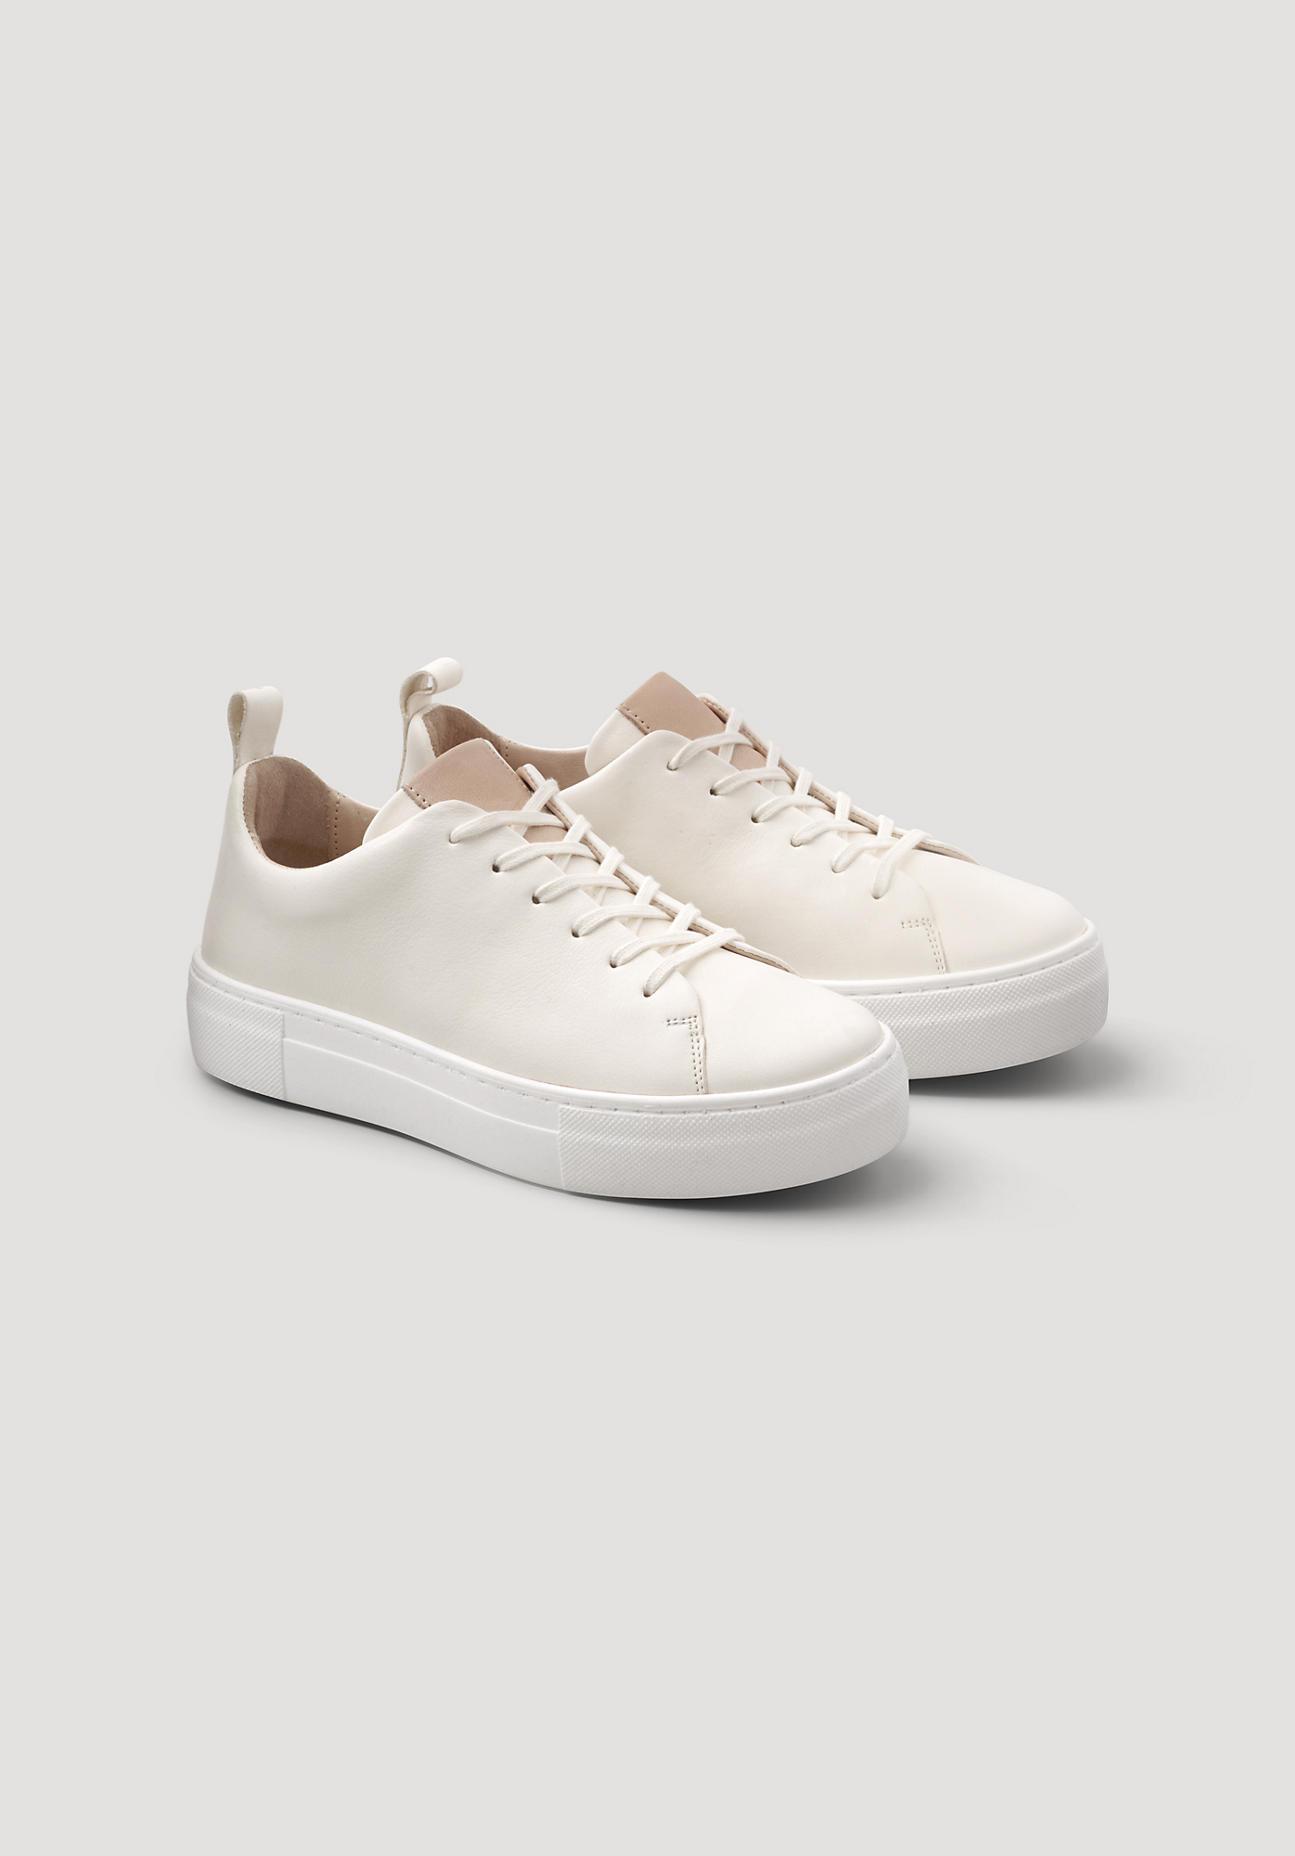 hessnatur Damen Damen Sneaker aus Leder – weiß – Größe 37